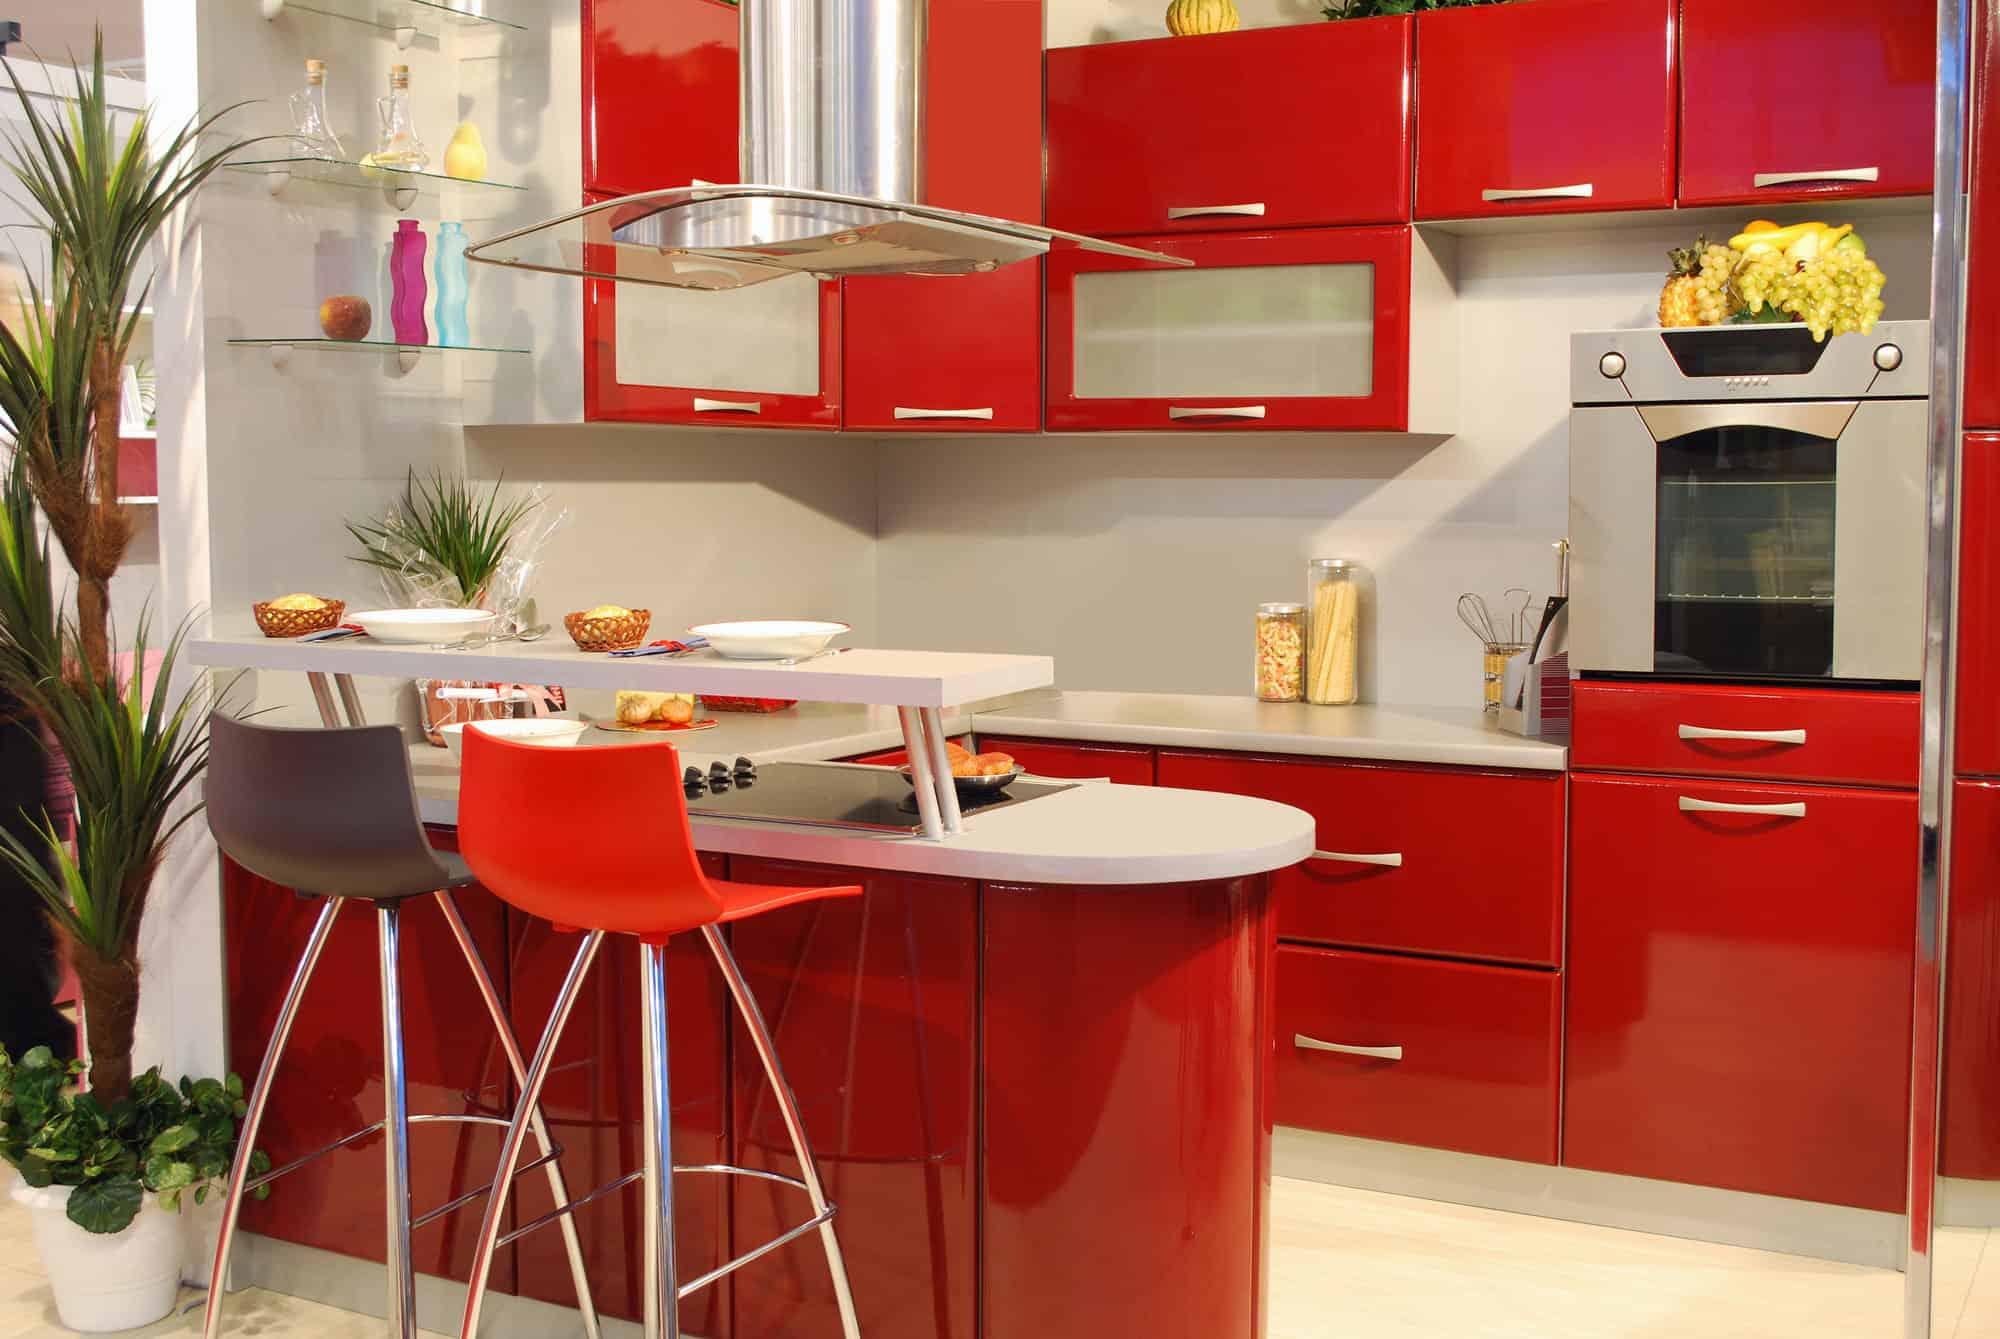 kitchen remodel contractors in palm desert | custom cabinets | design